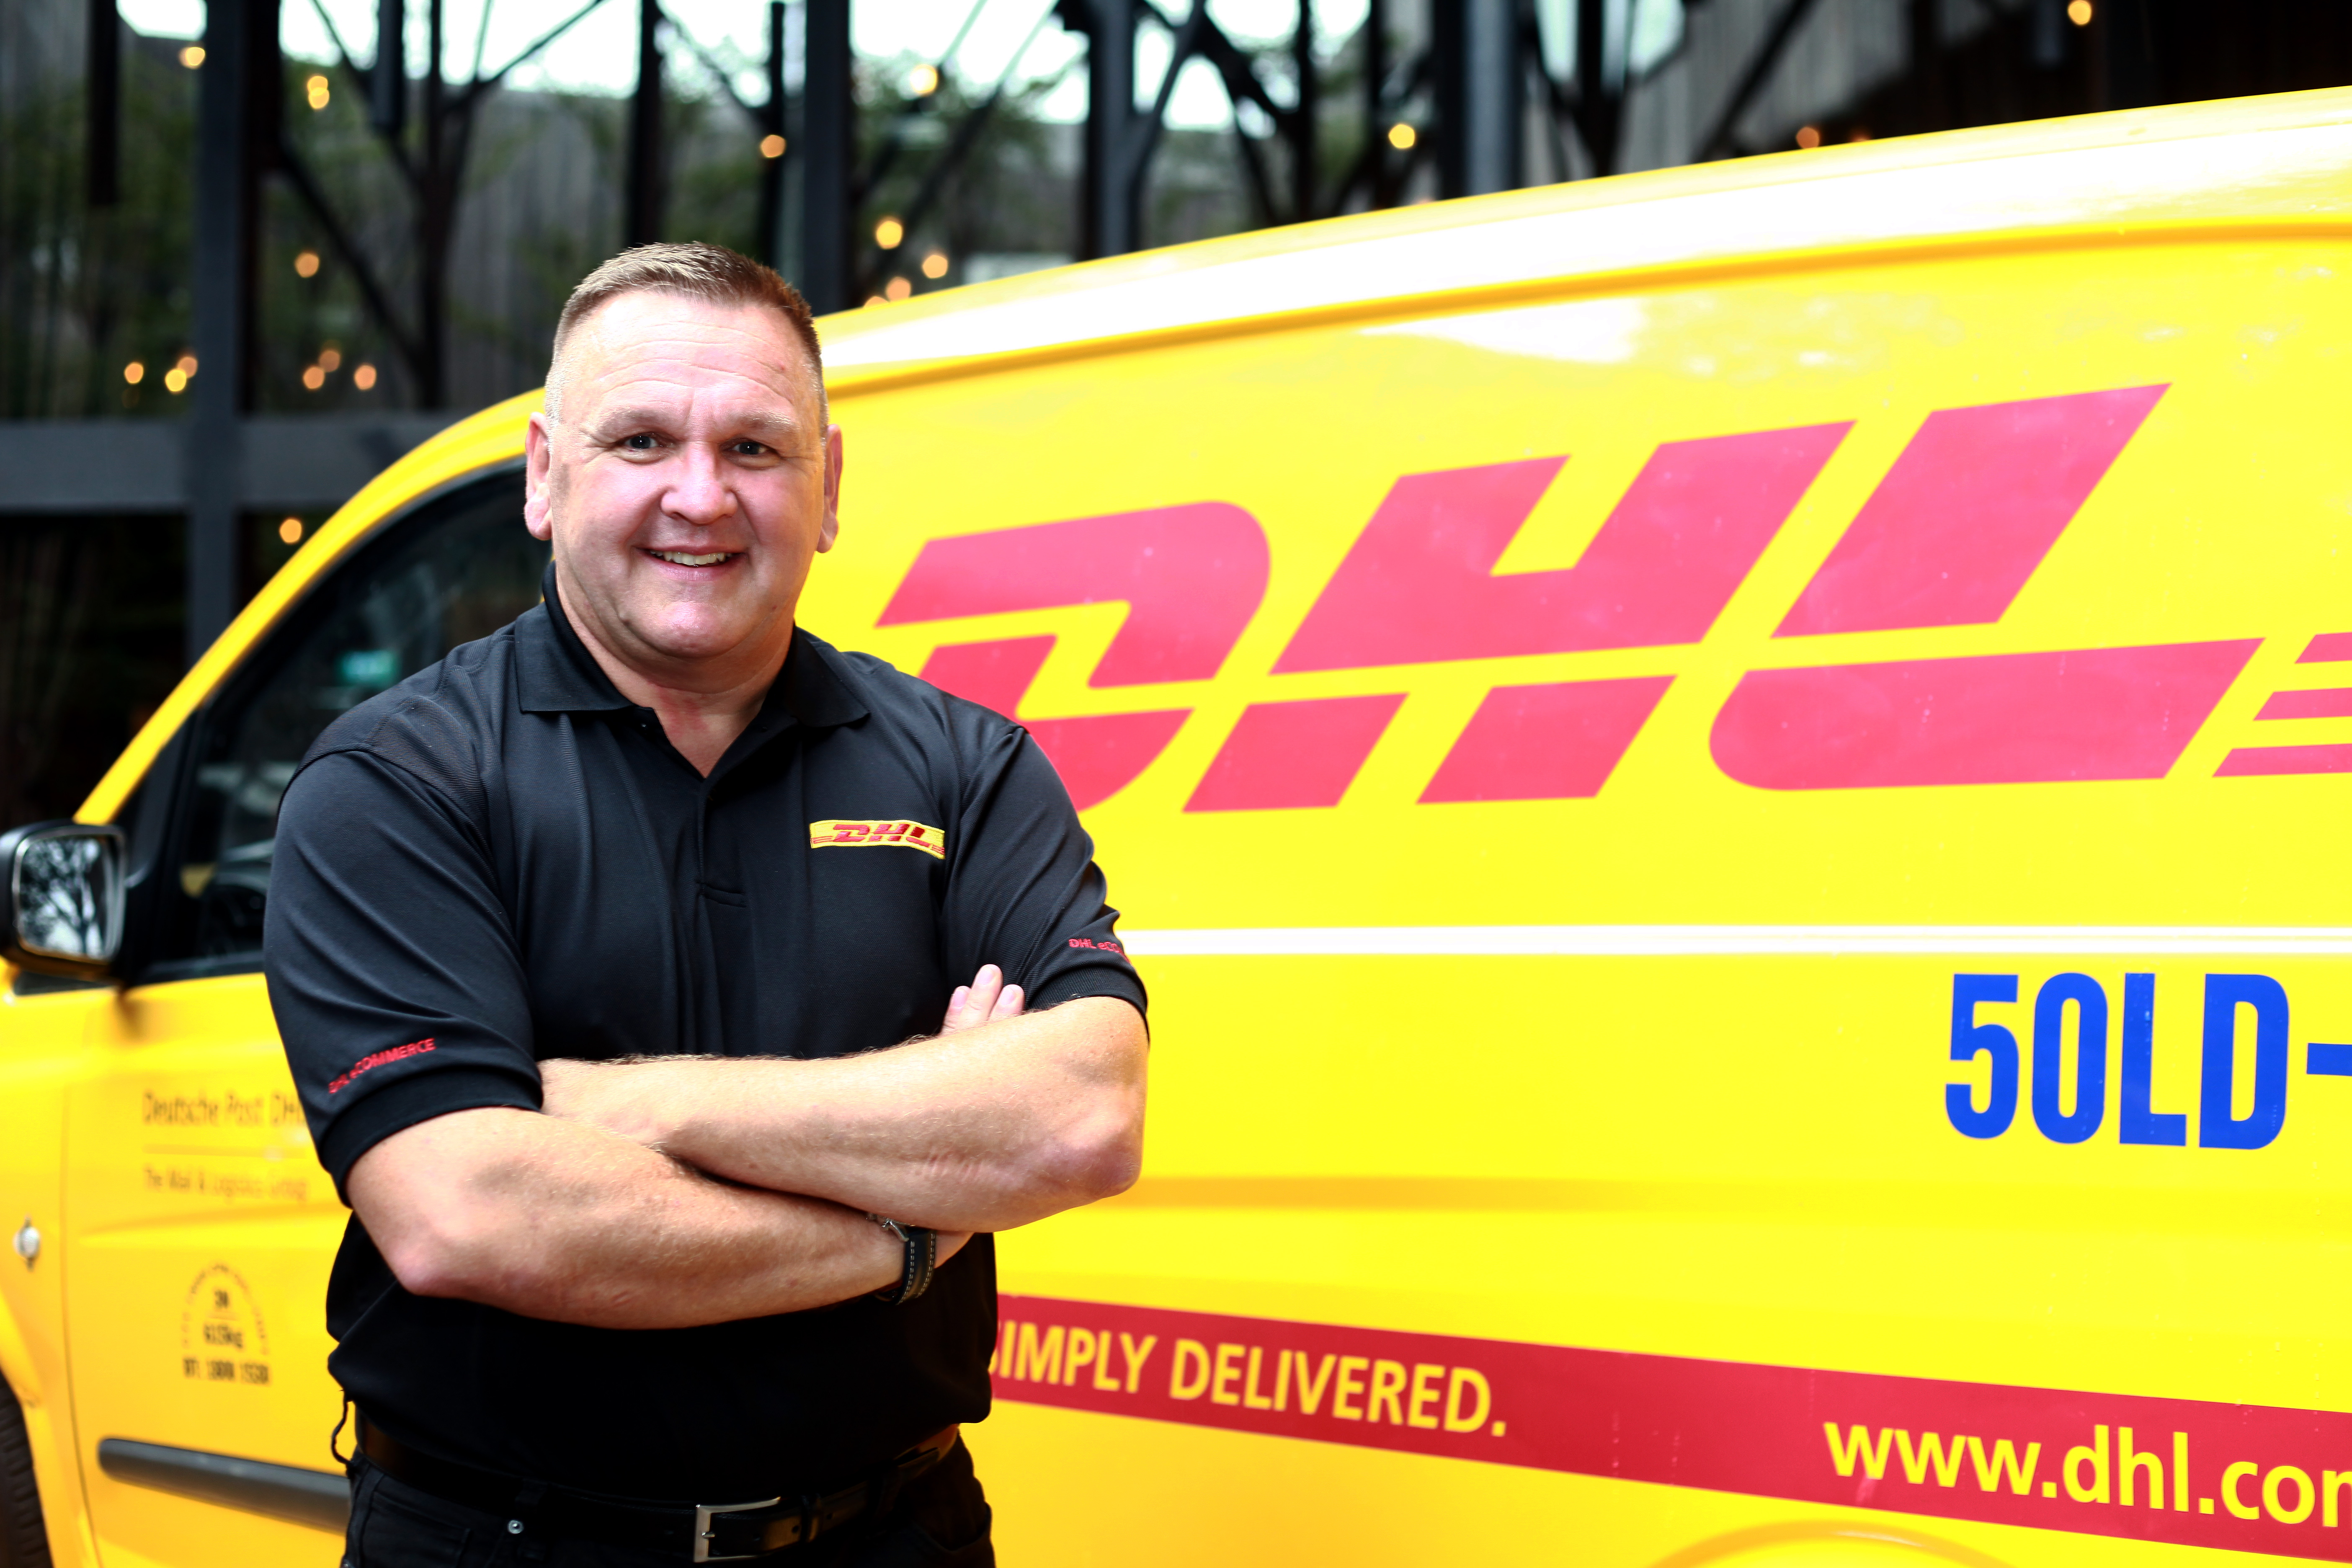 DHL eCommerce enters Vietnam's bustling e-commerce market